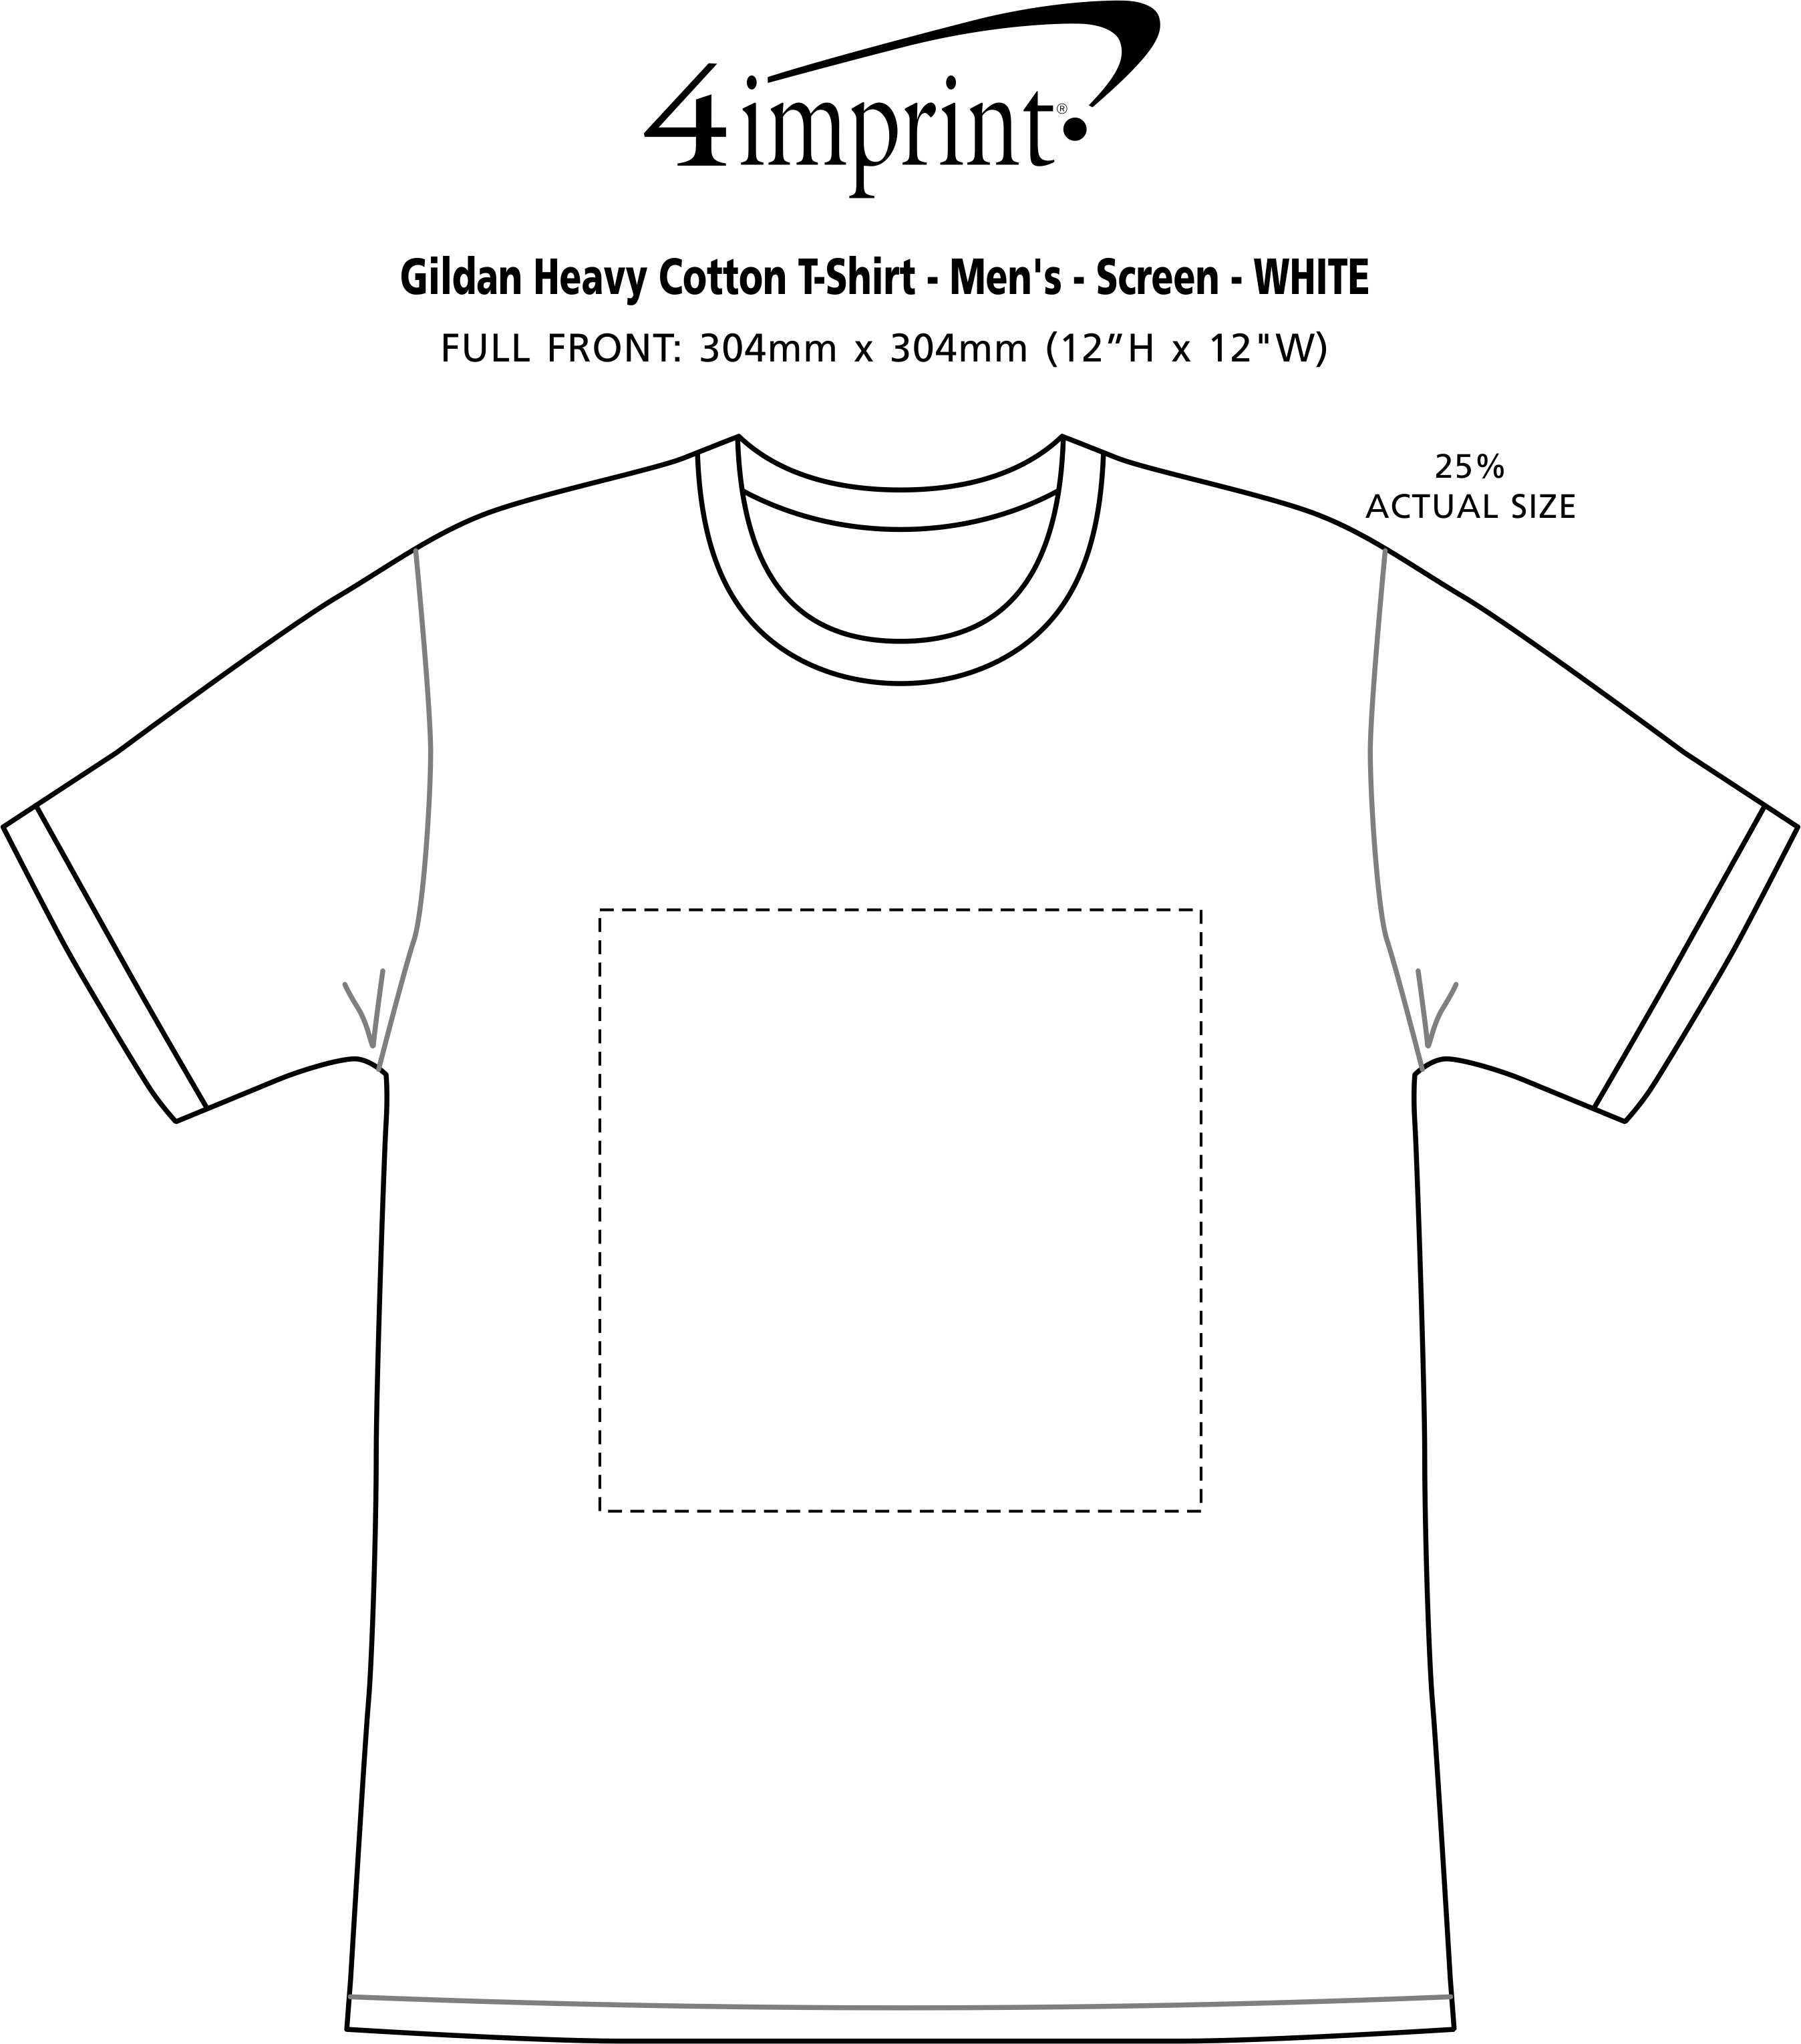 Imprint Area of Gildan Heavy Cotton T-Shirt - Men's - Screen - White